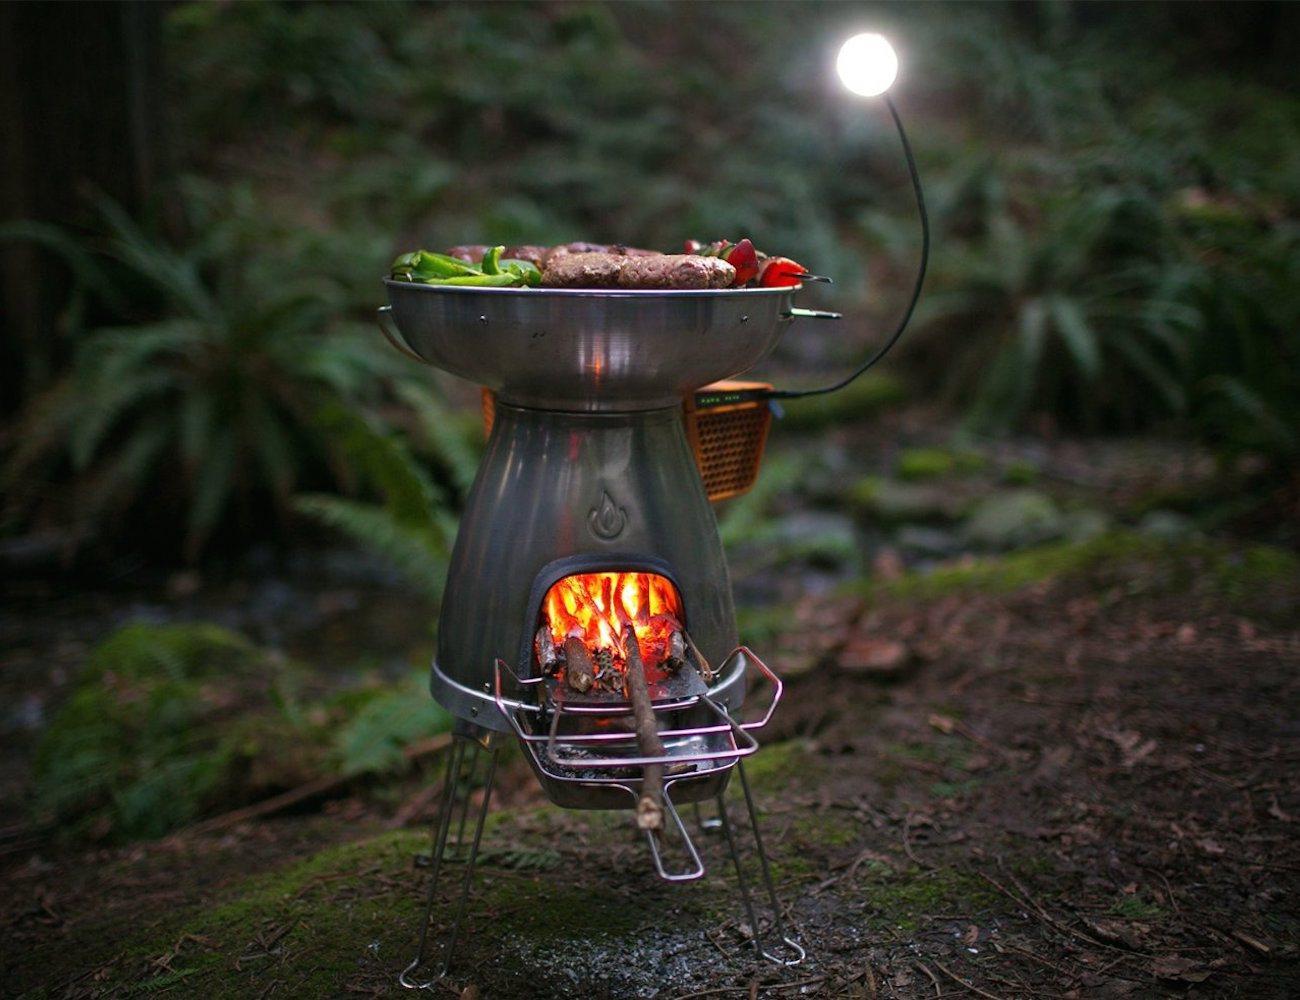 basecamp wood burning stove and grill by biolite review. Black Bedroom Furniture Sets. Home Design Ideas